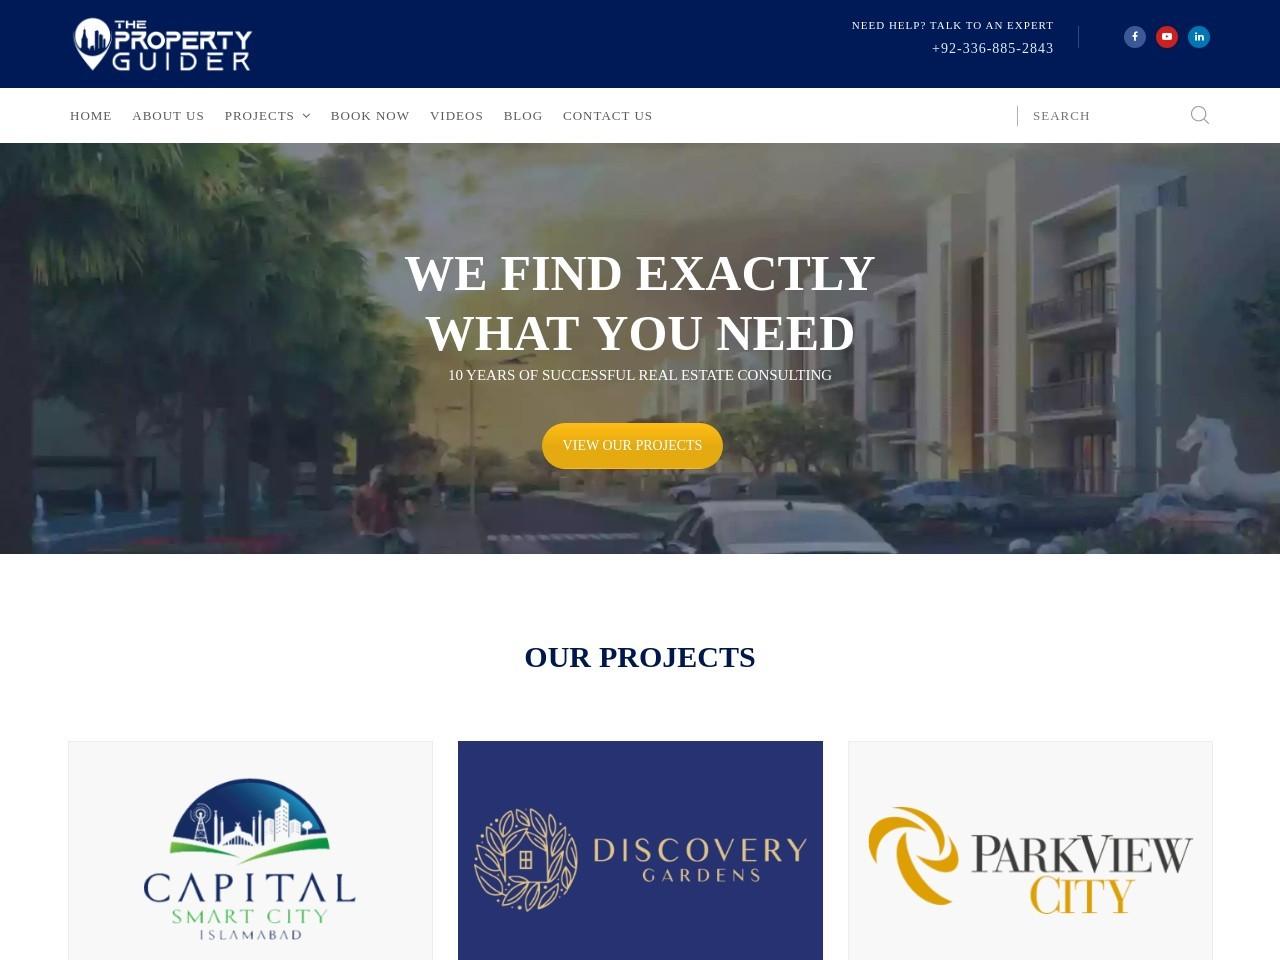 Nova City Islamabad Payment Plan